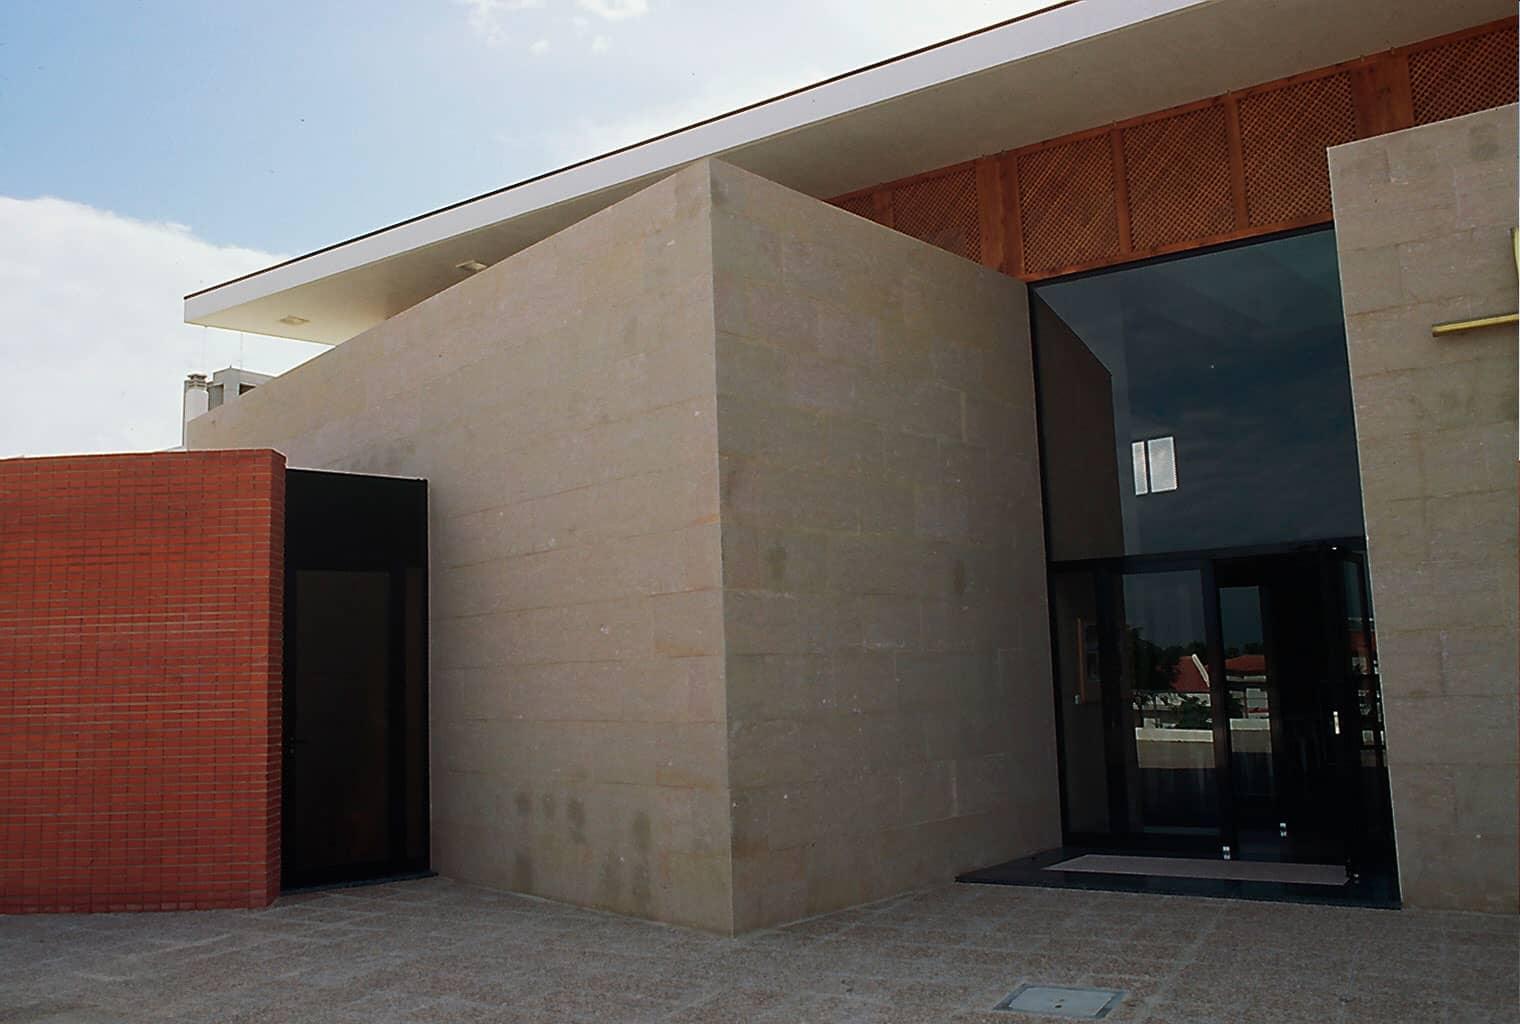 iglesia de gavarda 5